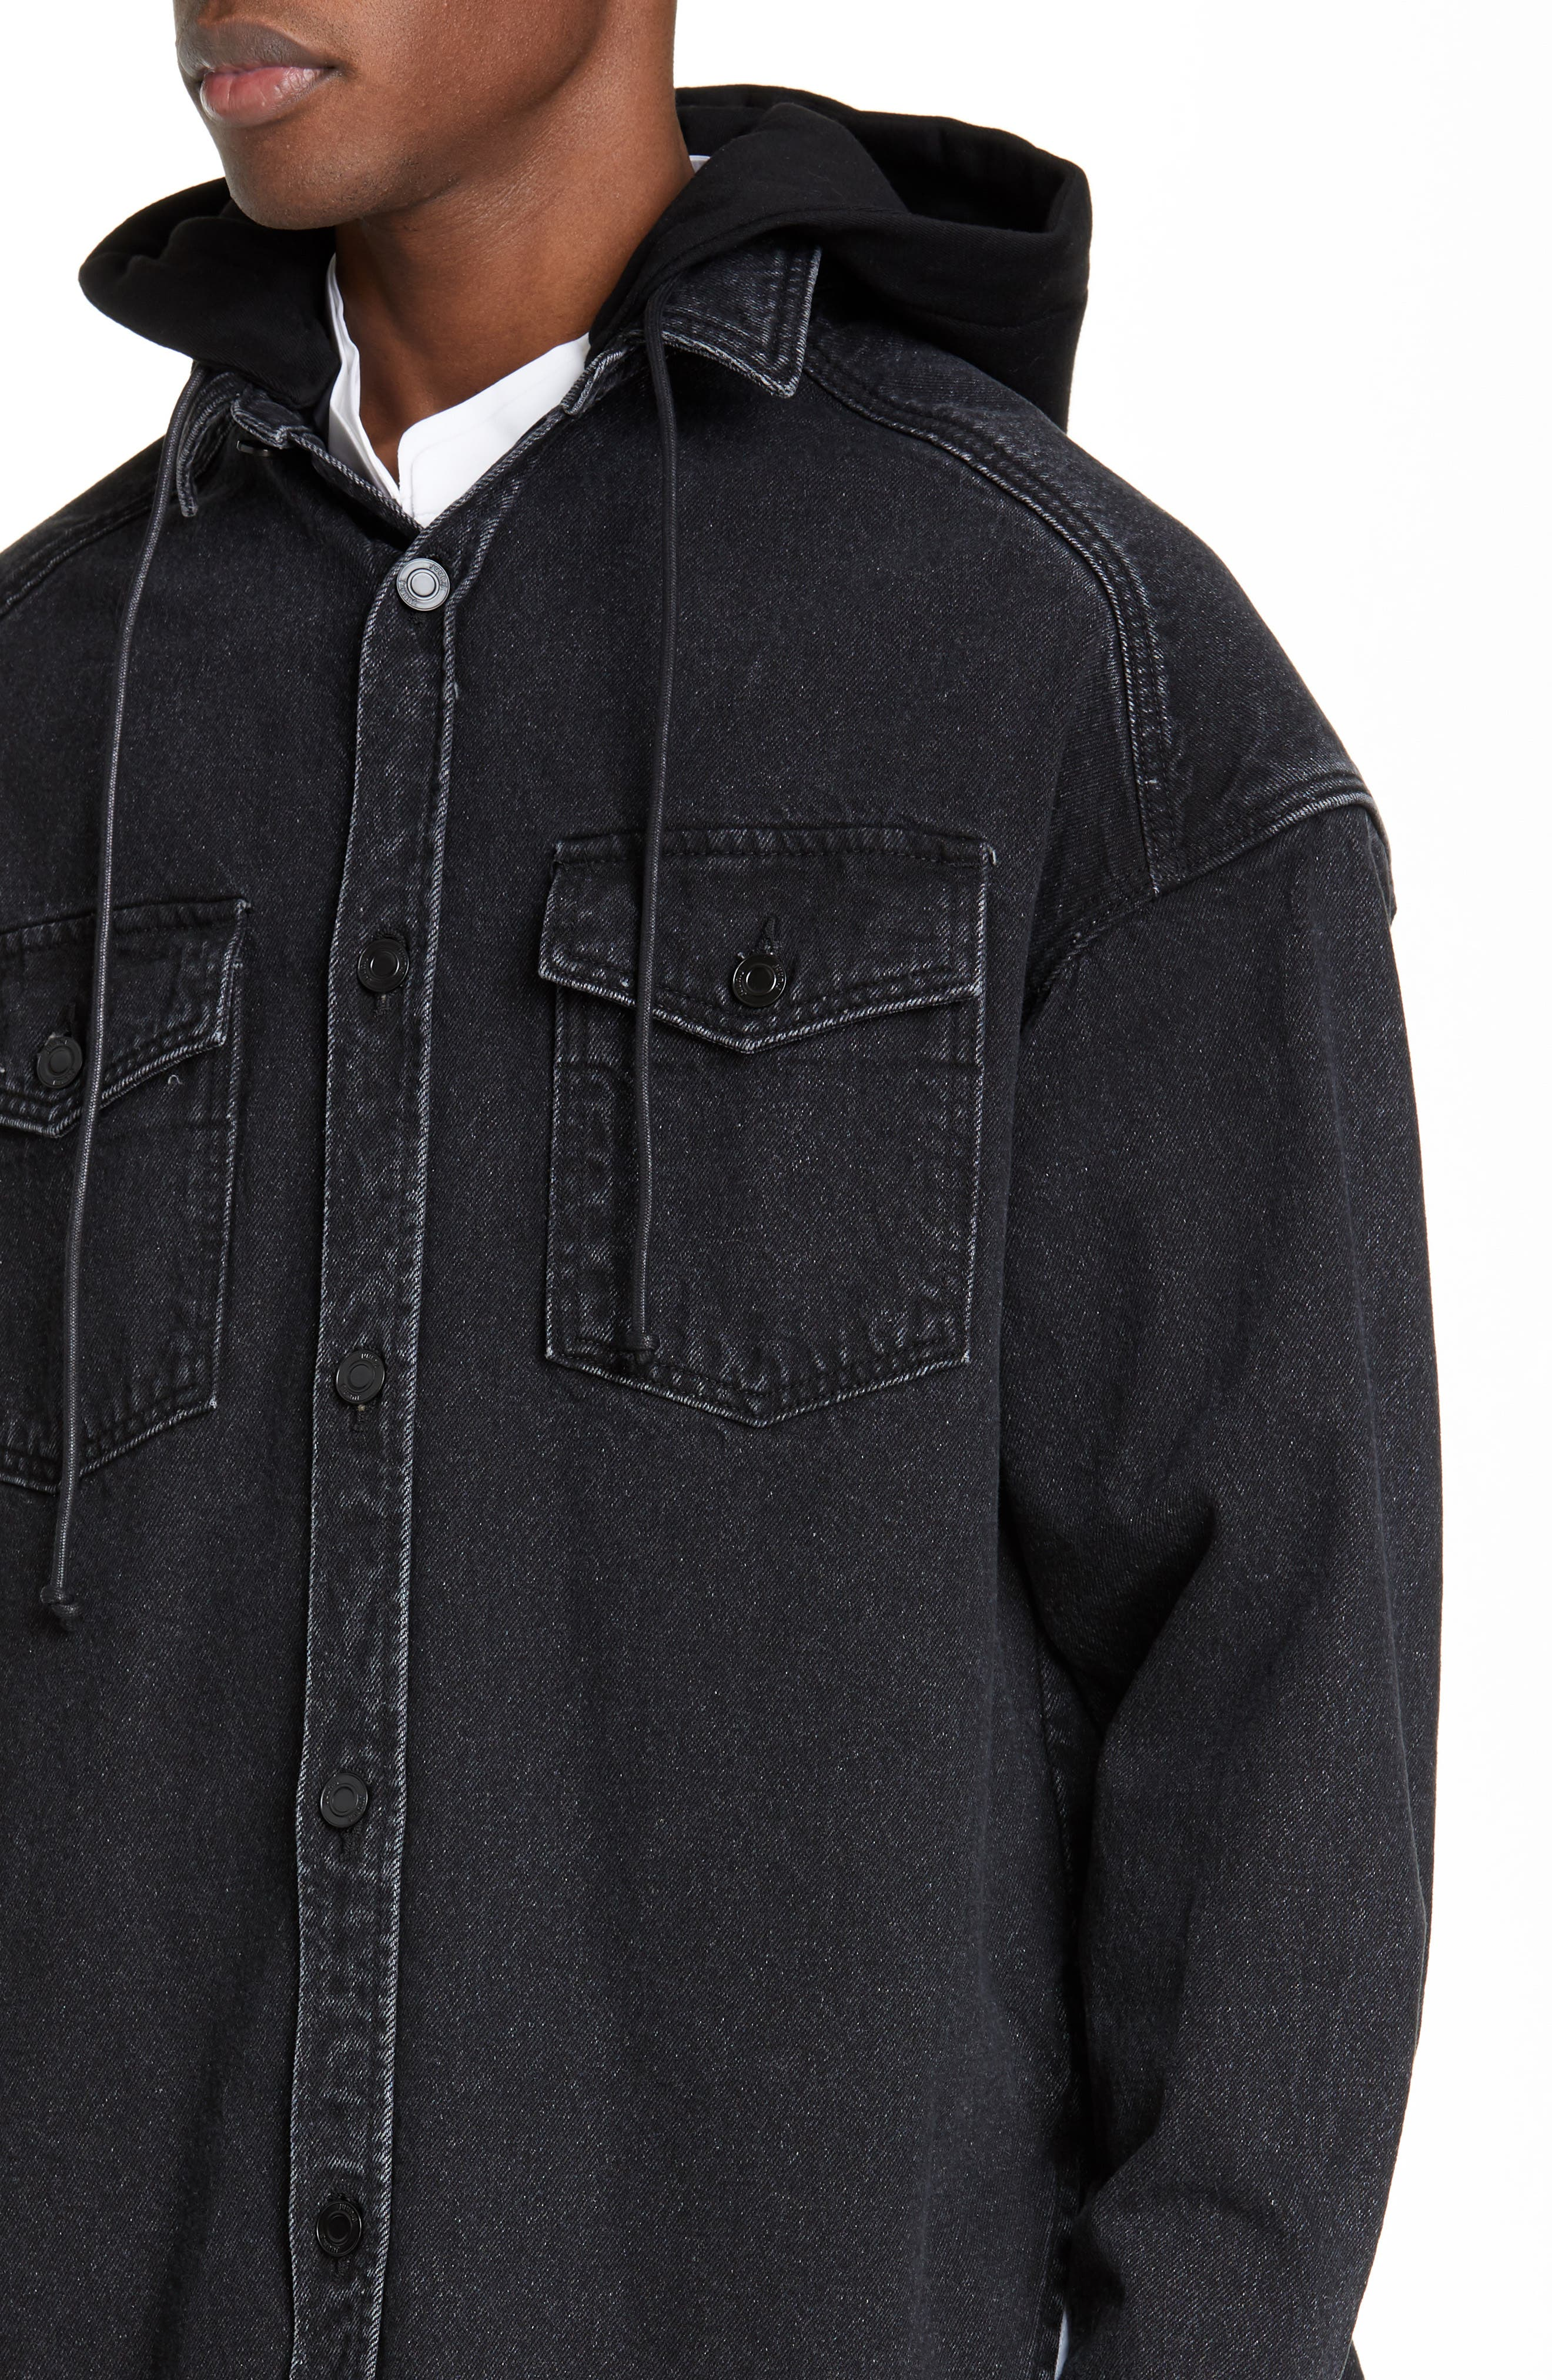 JUUN.J, Denim Shirt with Detachable Hood, Alternate thumbnail 2, color, BLACK